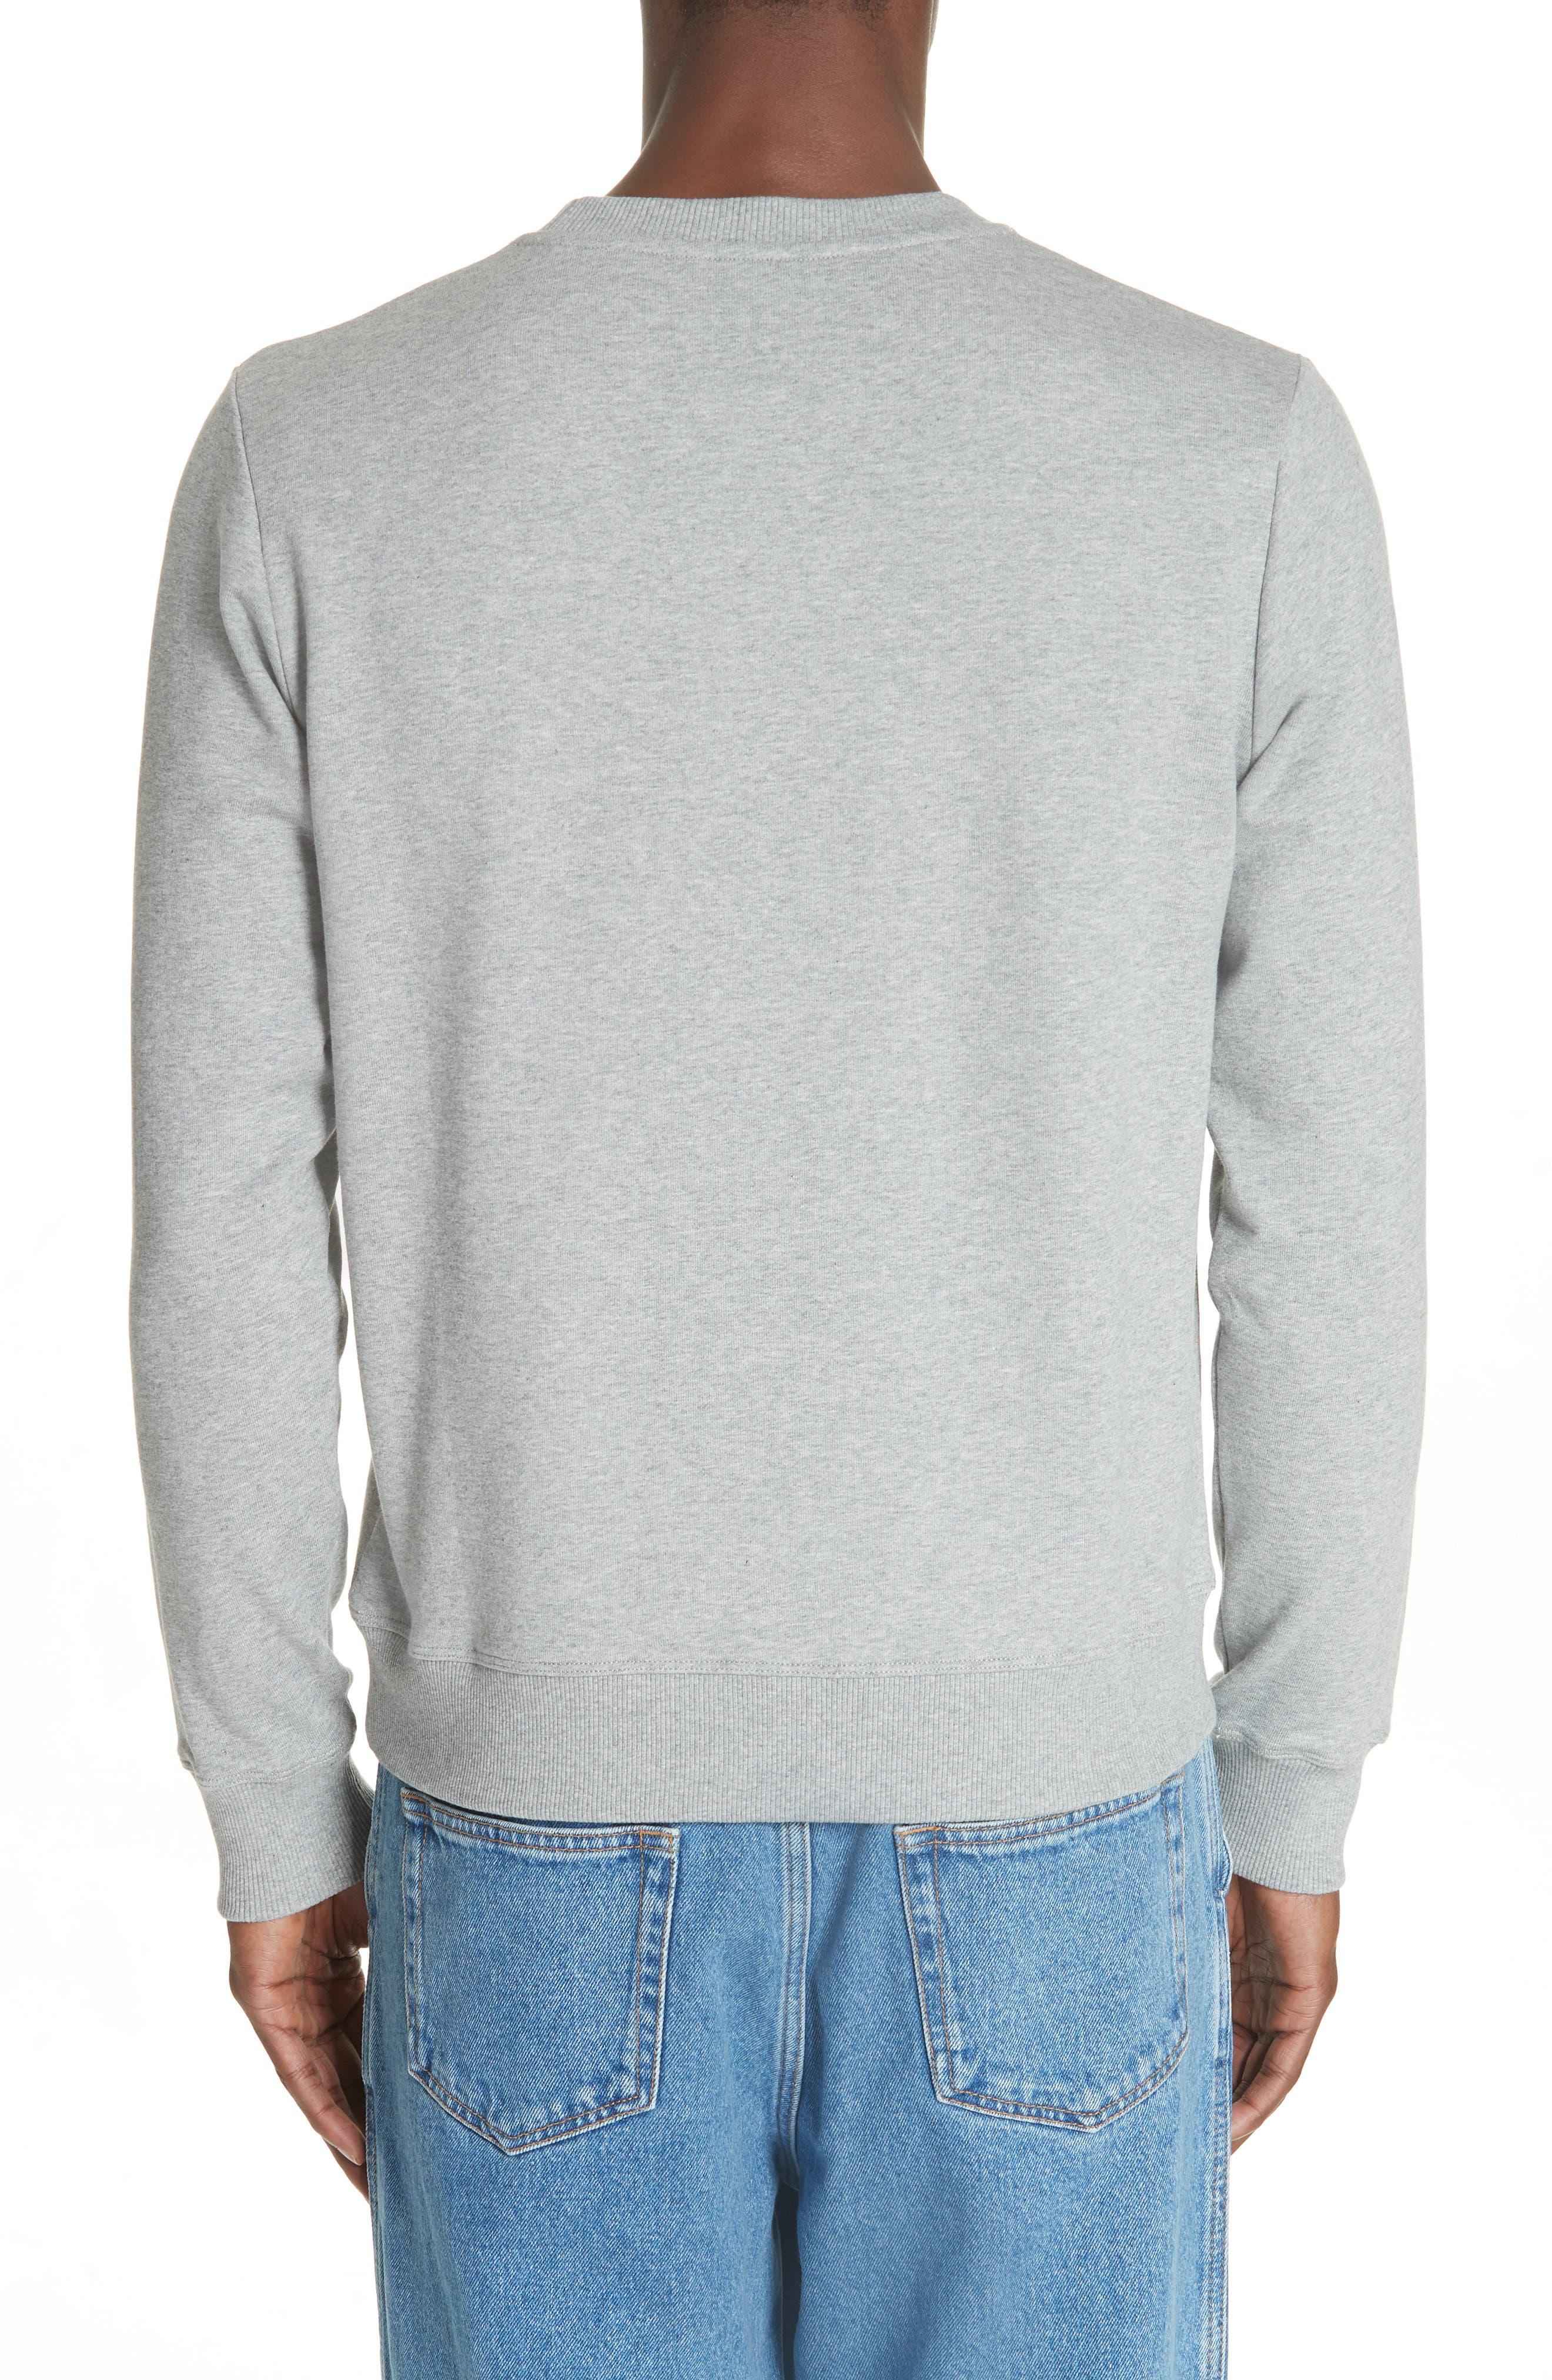 Embroidered Anagram Logo Sweatshirt,                             Alternate thumbnail 2, color,                             1120 GREY